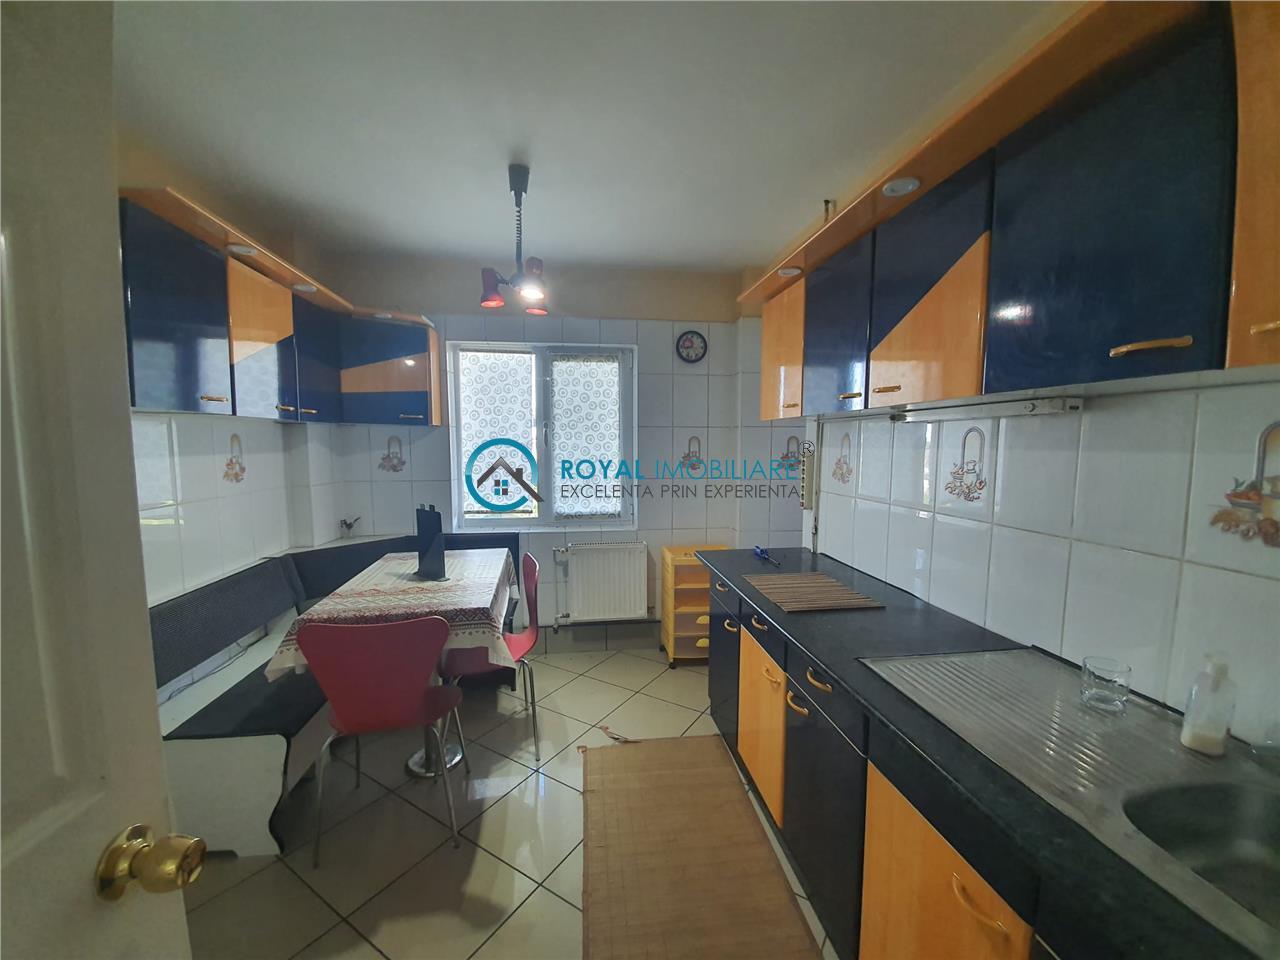 Royal Imobiliare   Vanzare Apartament zona Mihai Bravu